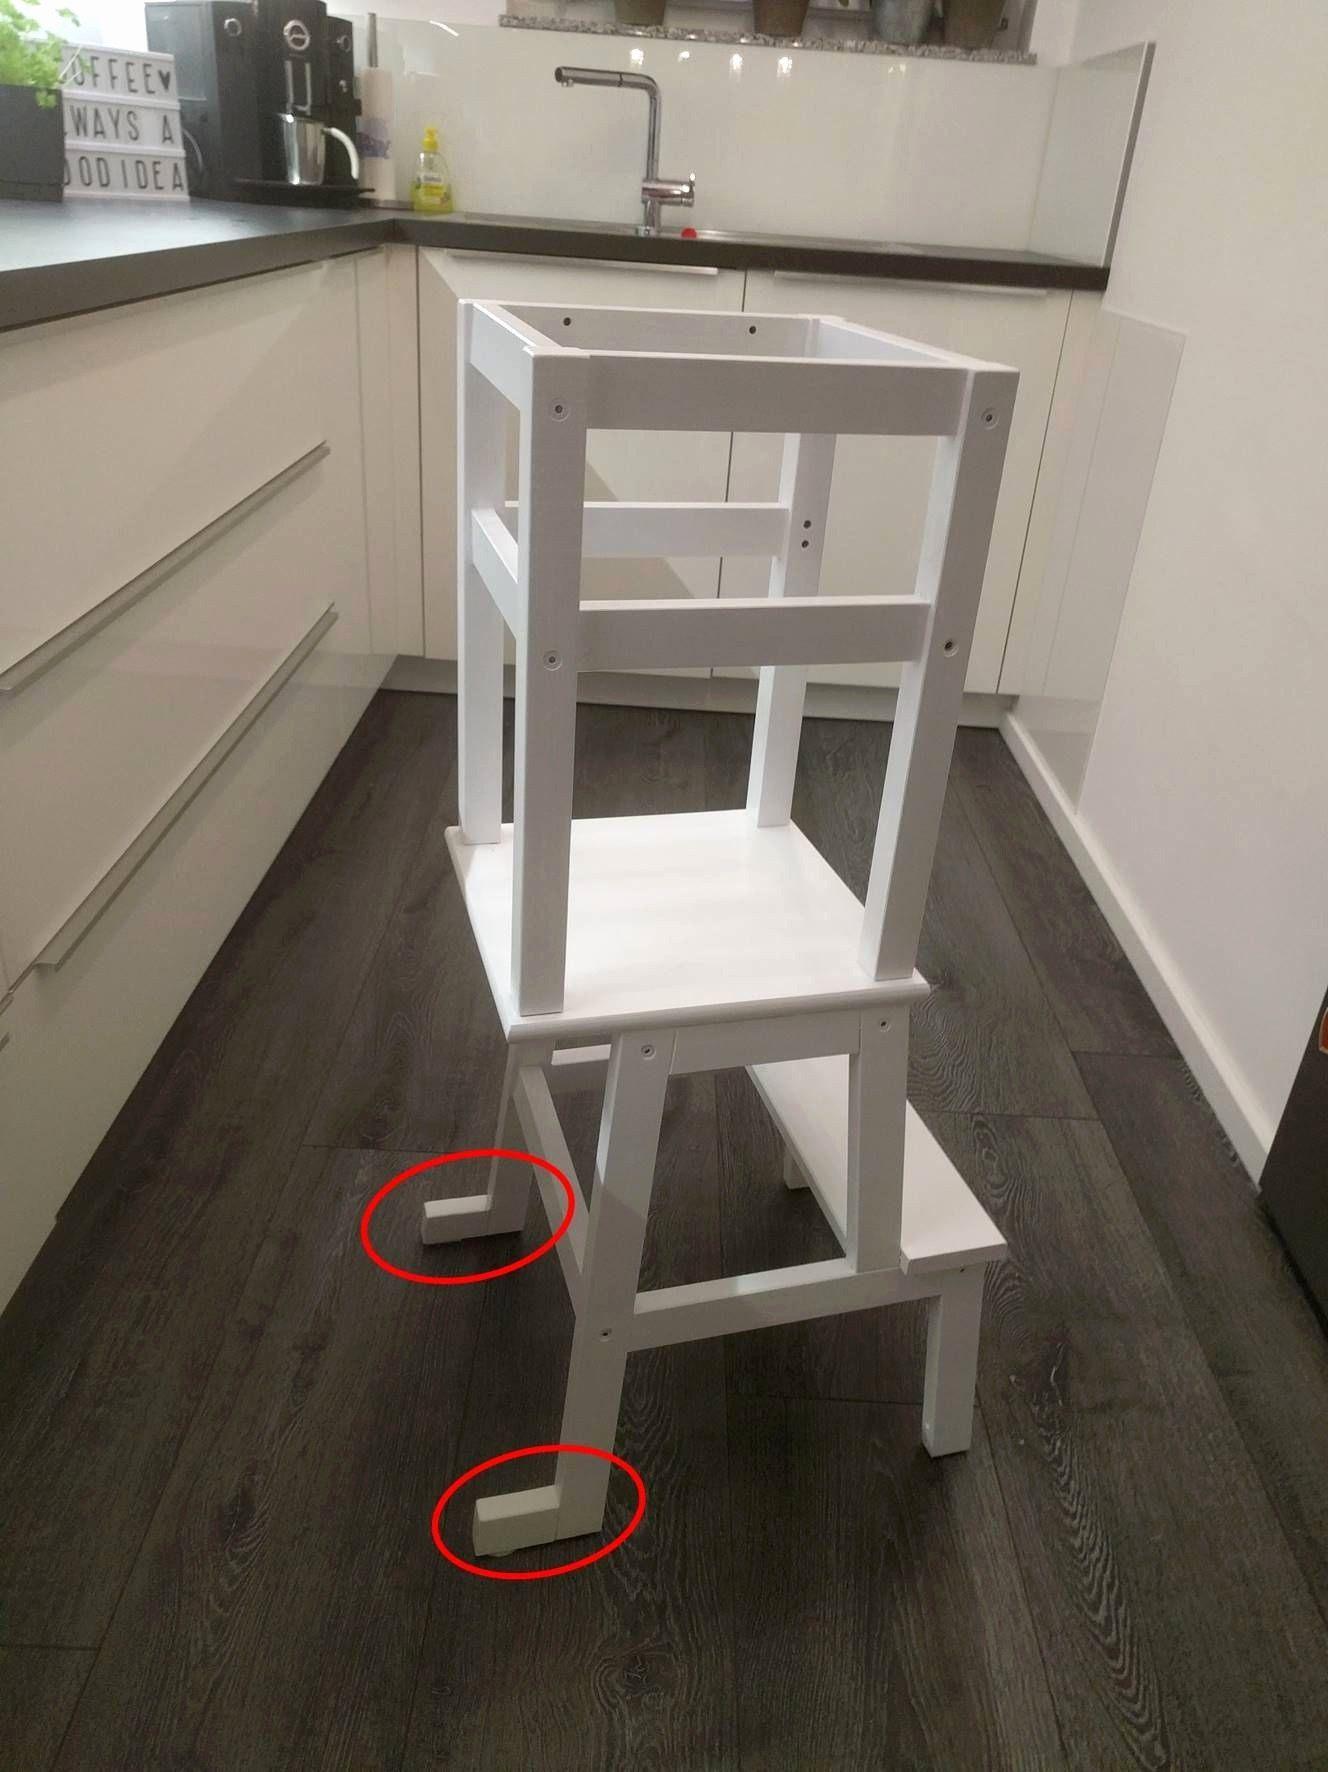 Lit Superposé Avec Bureau Beau Lit Mezzanine Bureau Armoire 20 Beau S De Lit Avec Bureau Ikea